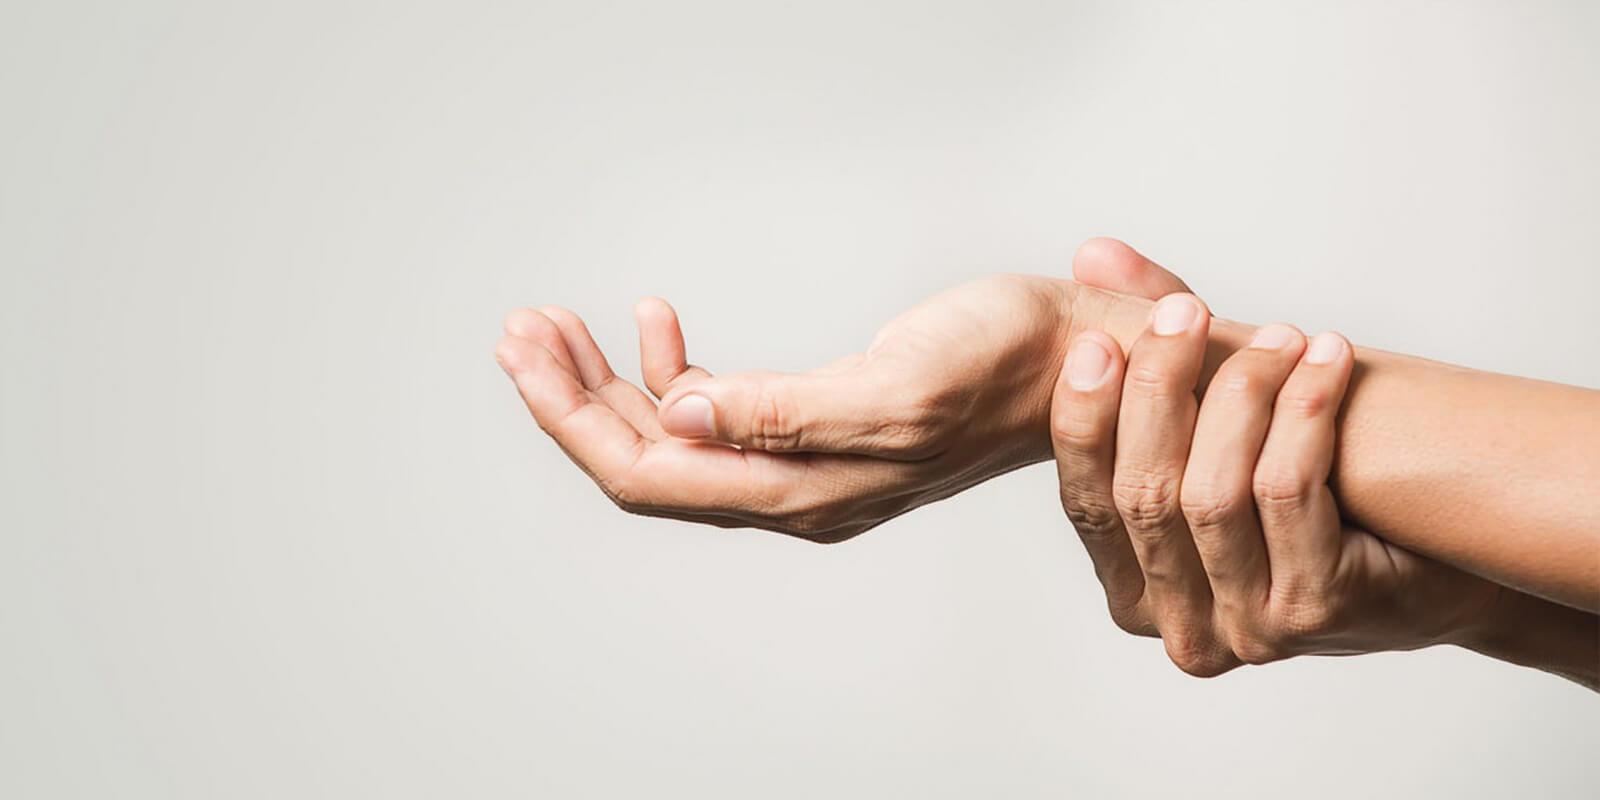 Mirabiliss Poliklinika, Niš - Sindrom karpalnog kanala